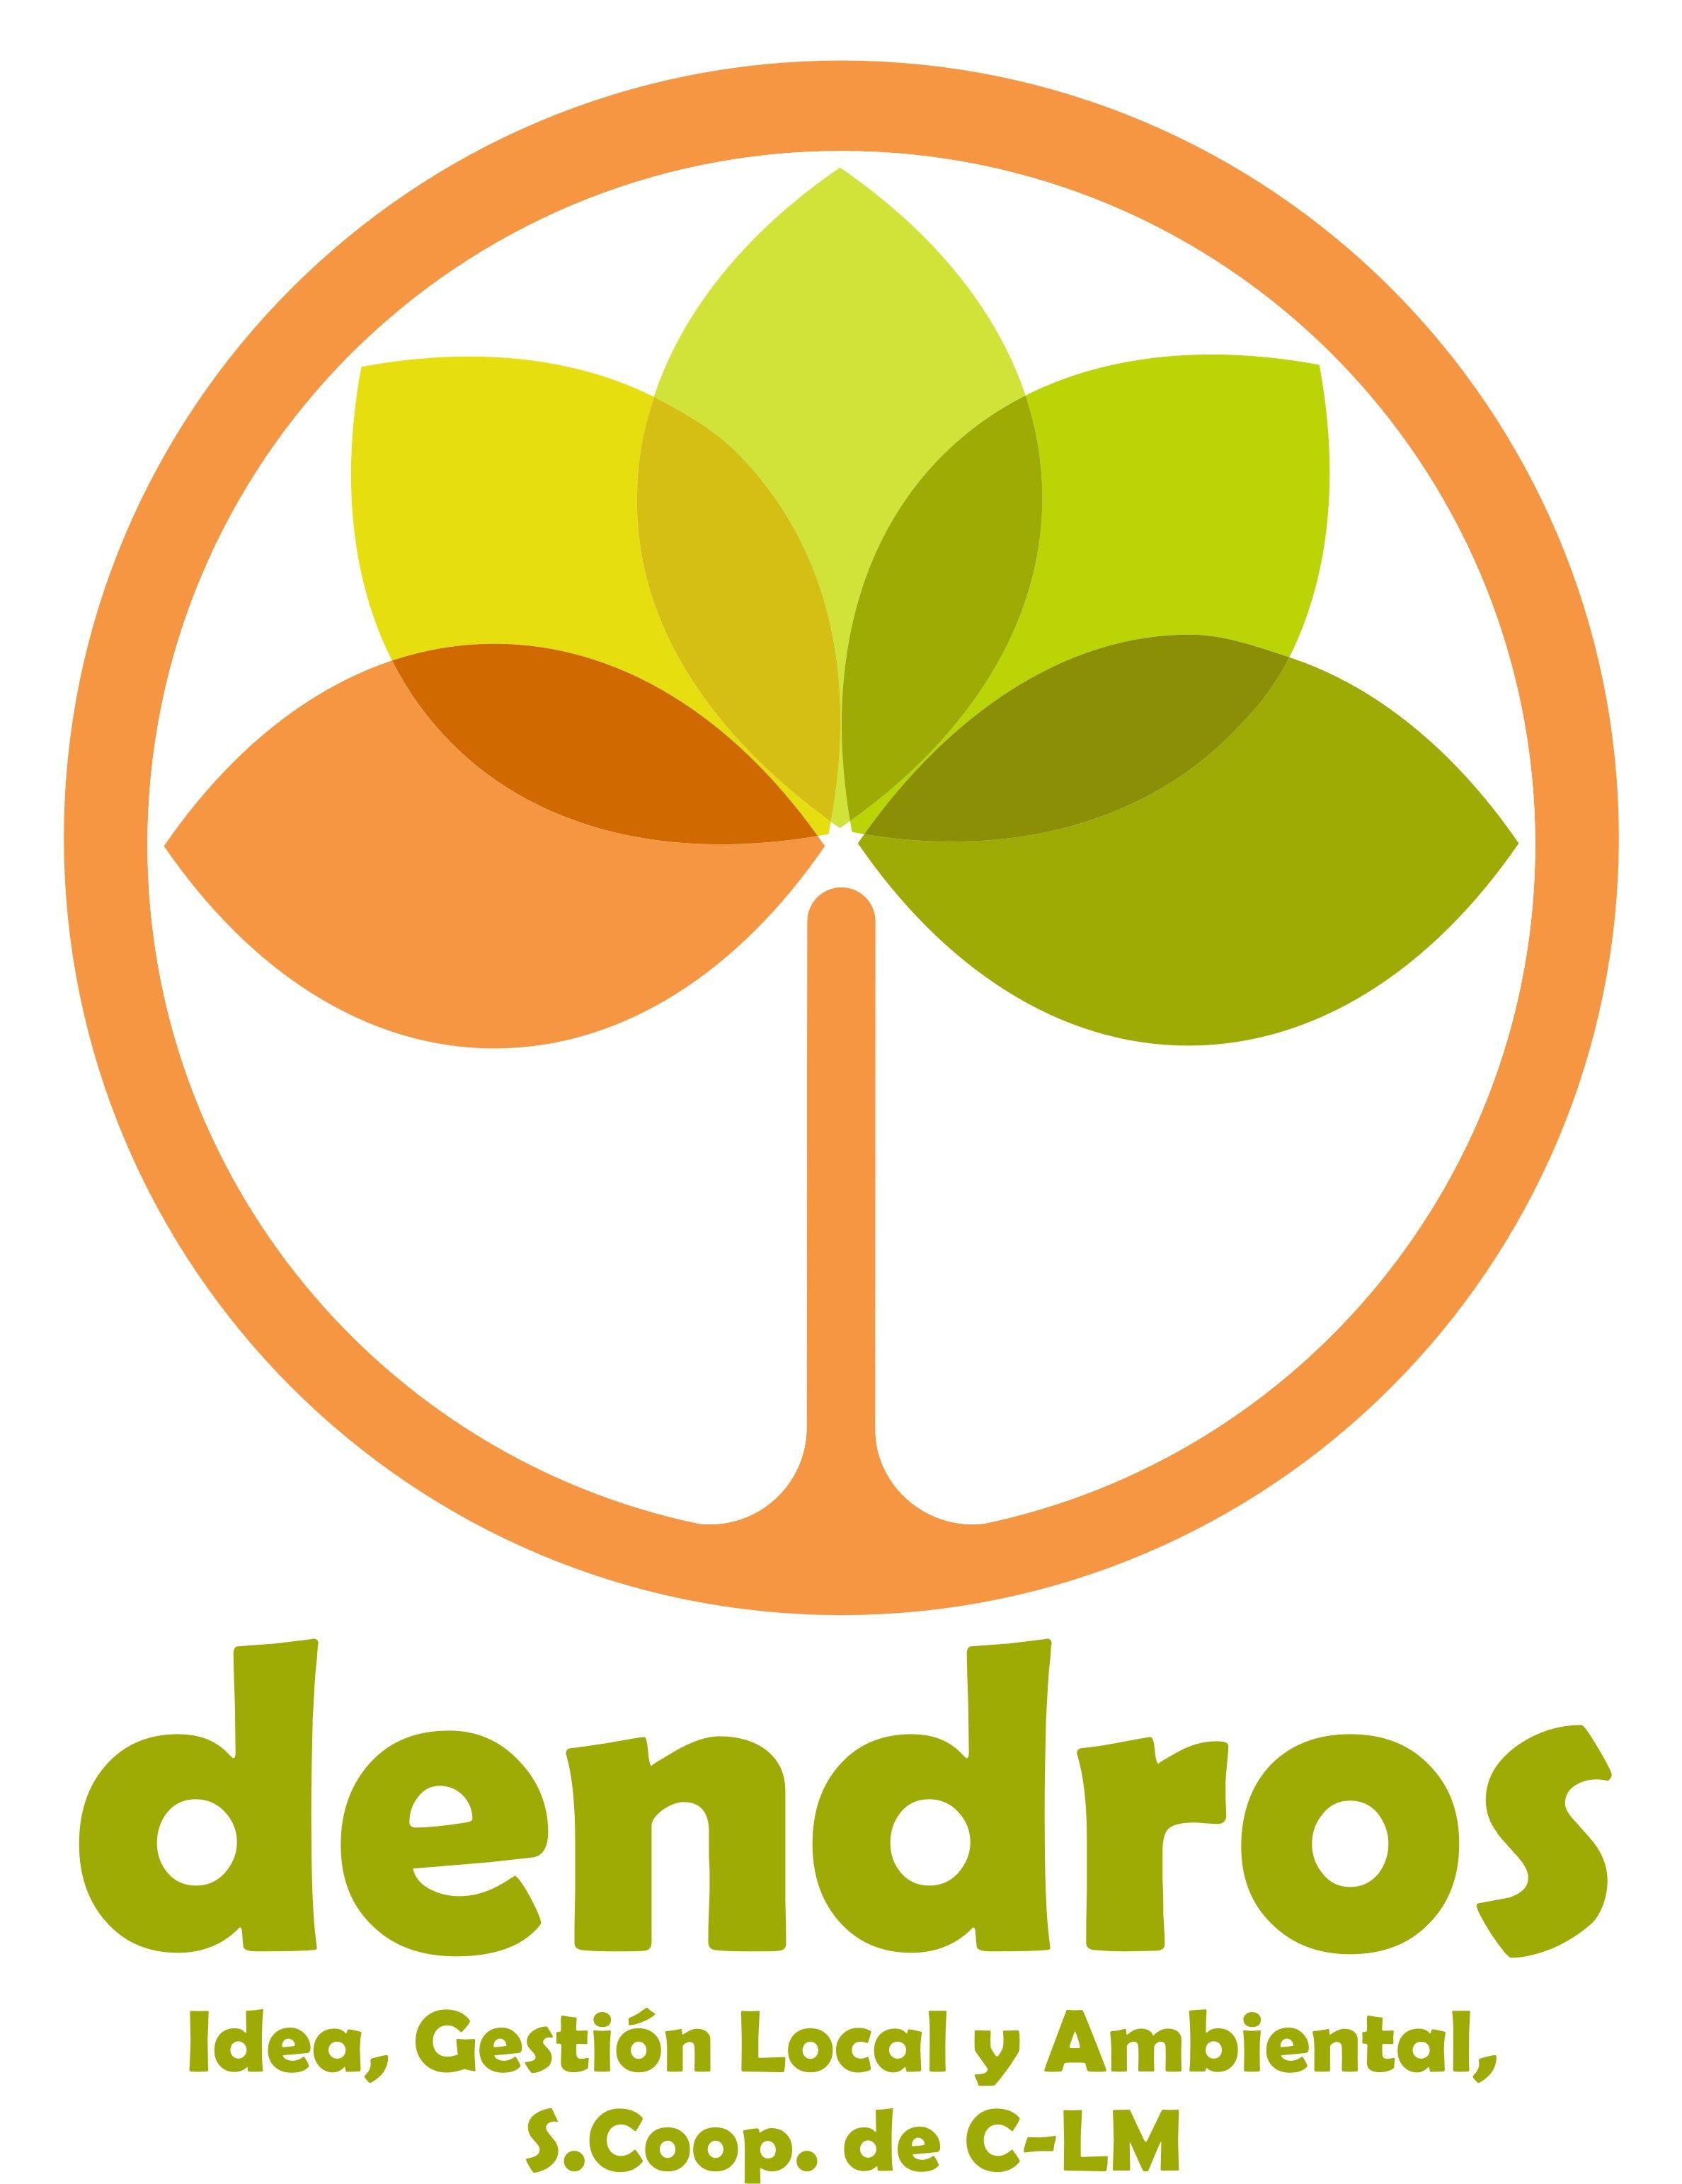 Dendros S. Coop. de C-LM